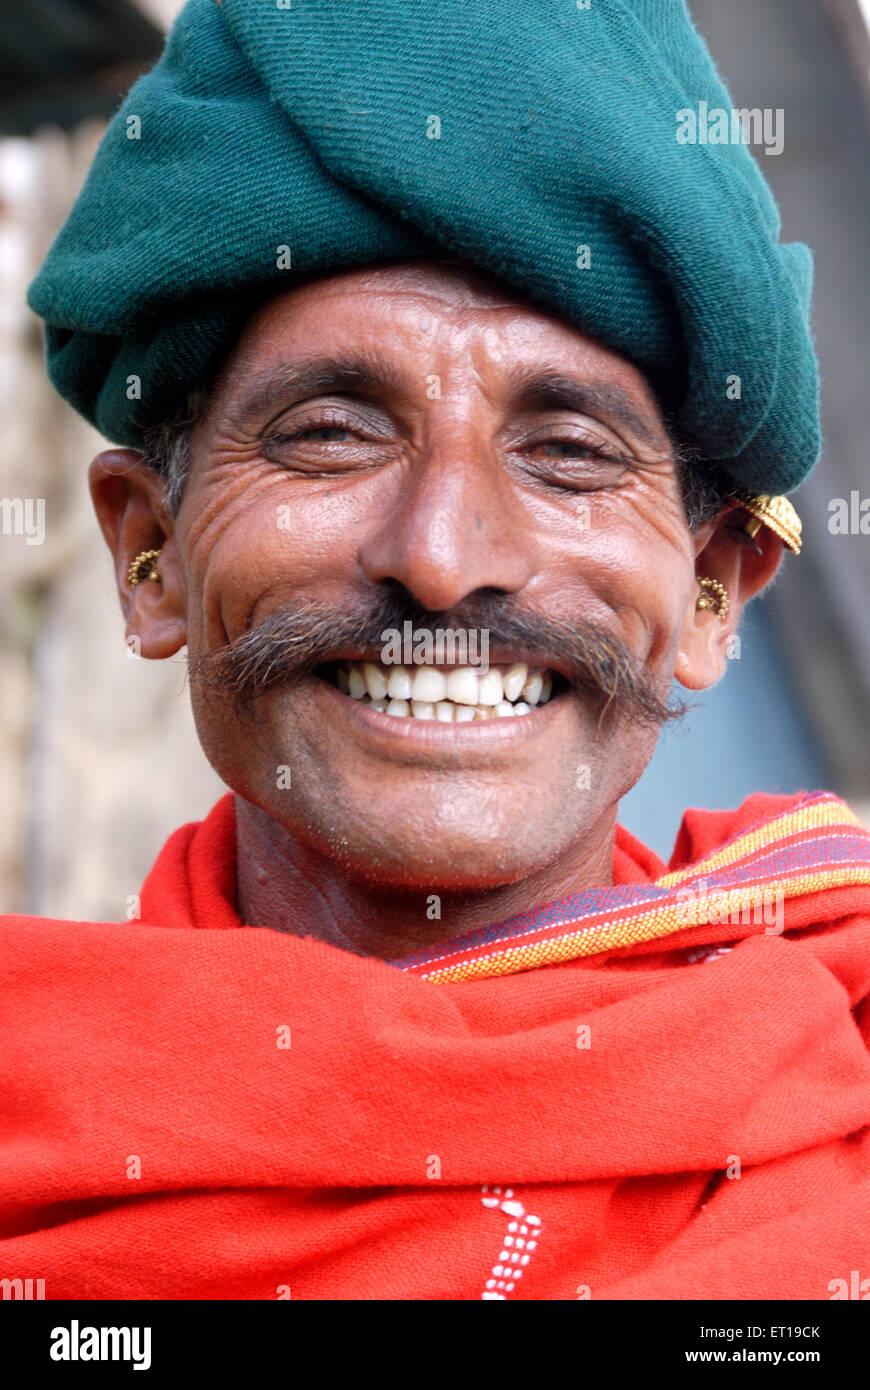 Shepherd looking at camera ; India MR#781T - Stock Image